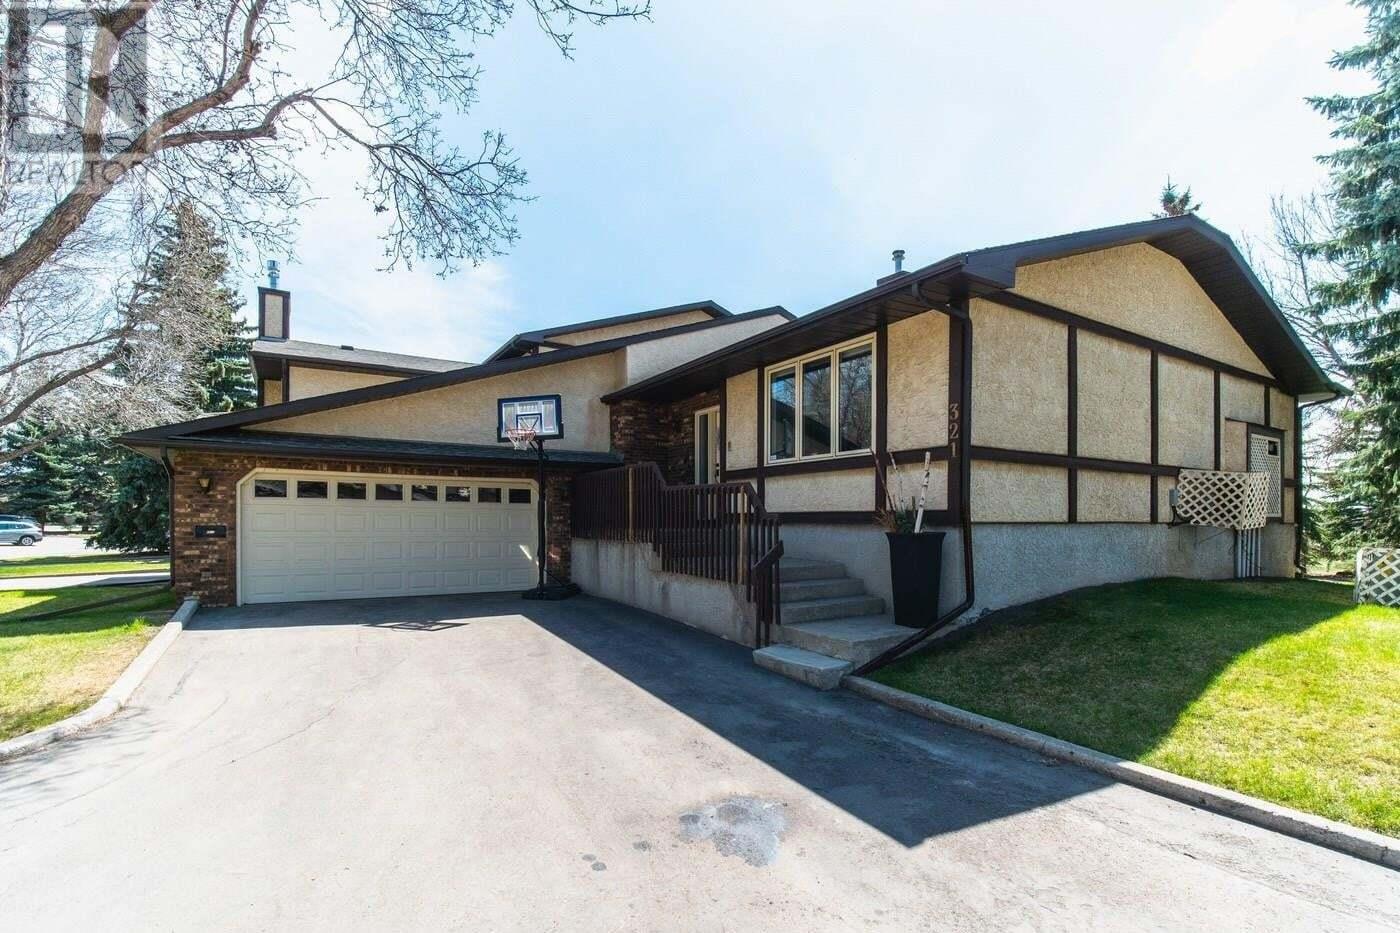 House for sale at 321 Avon Dr Regina Saskatchewan - MLS: SK819500